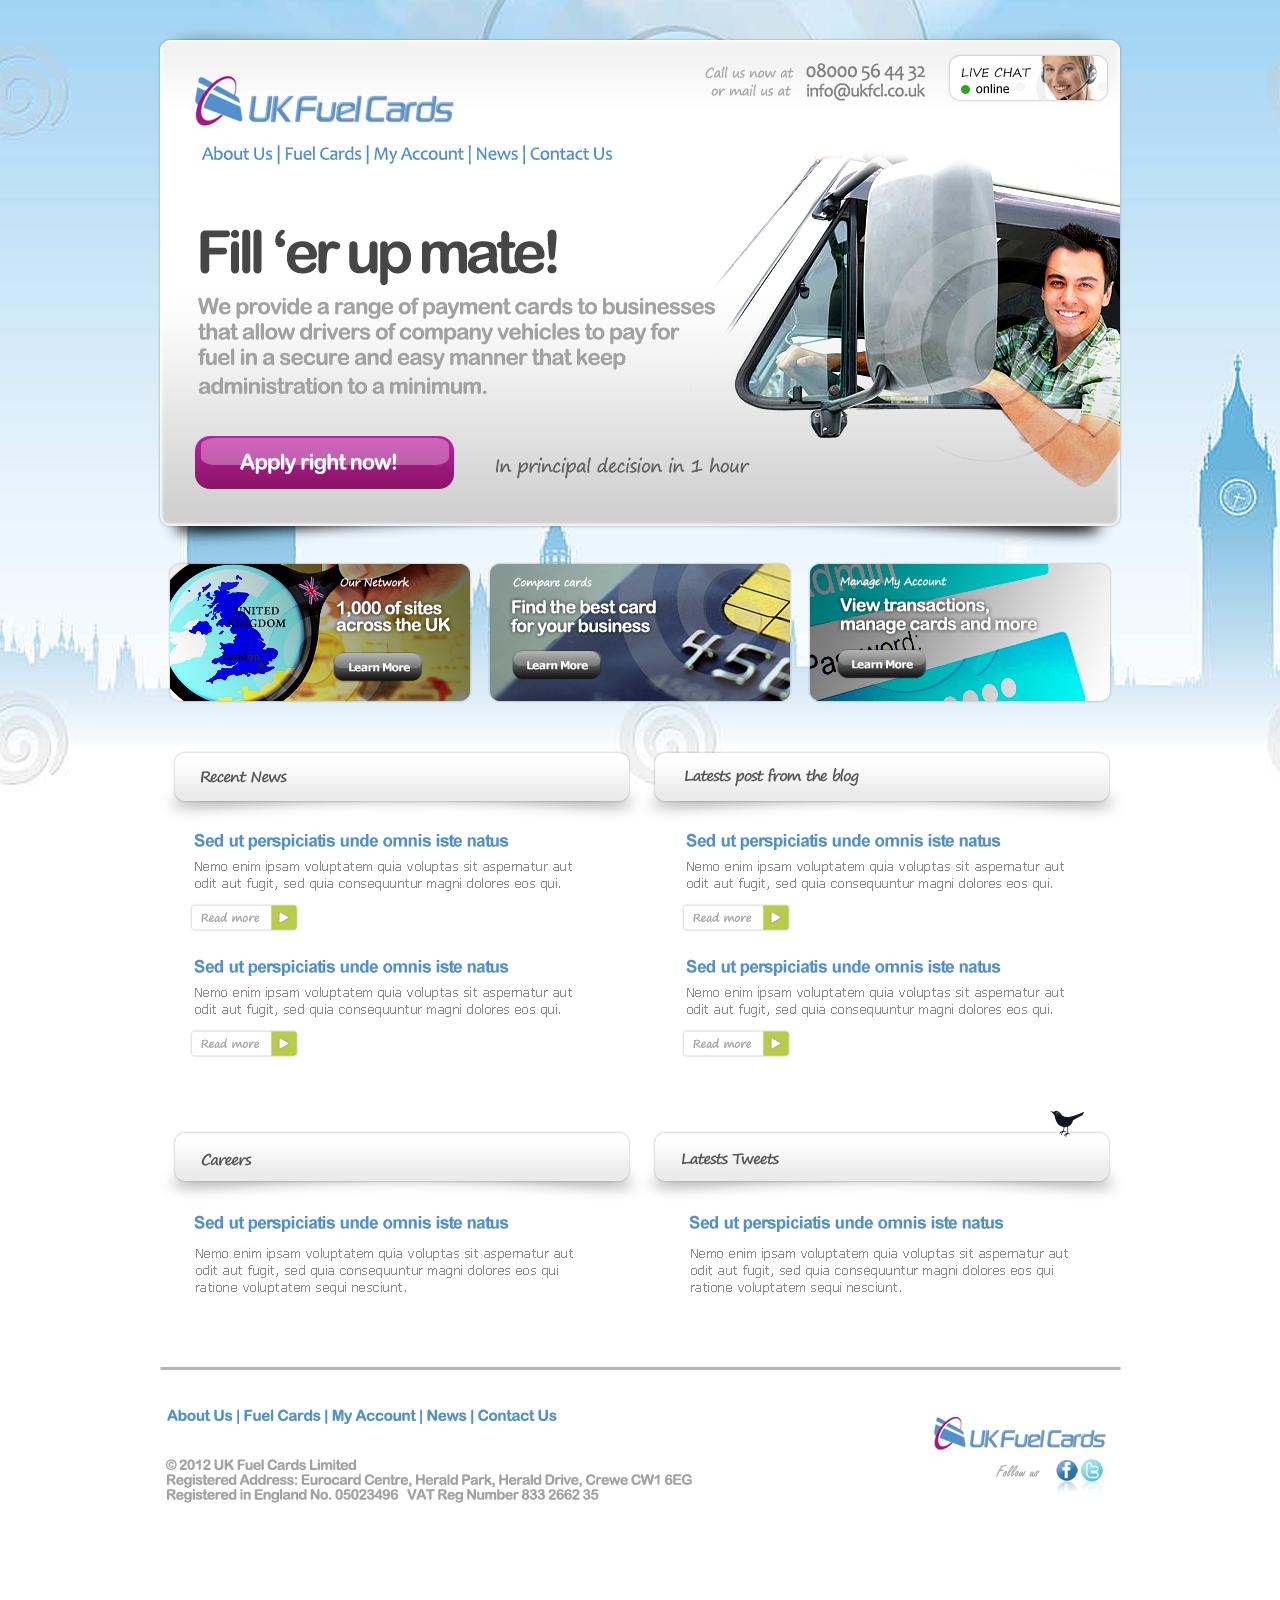 UK Fuel Cards needs a new website design